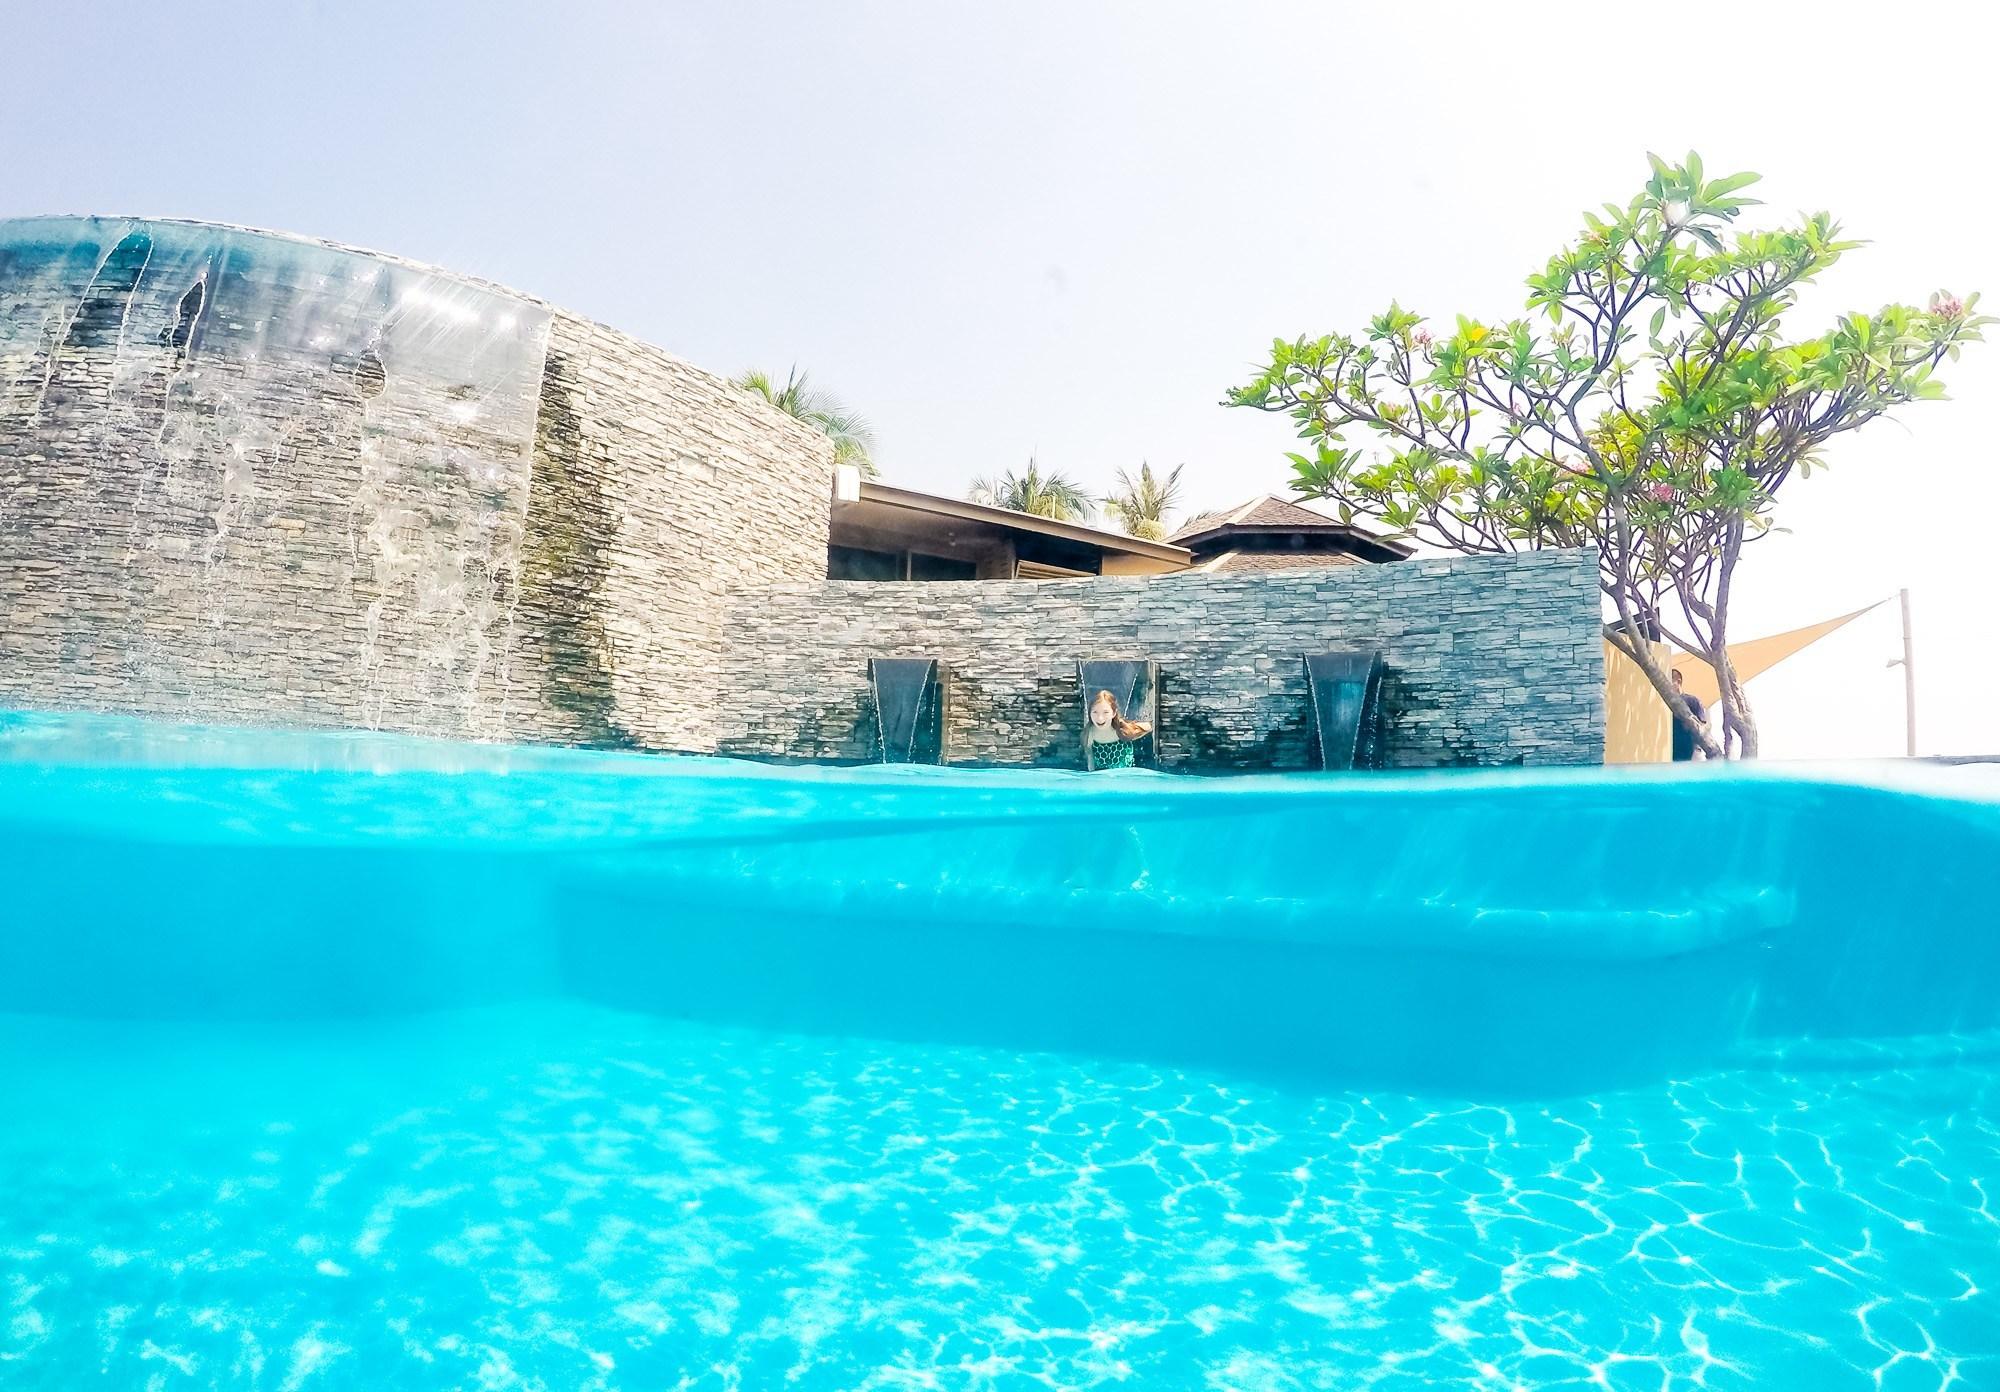 Shangri-la's Tanjung Aru Resort and Spa Pool shot with a GoPro dome